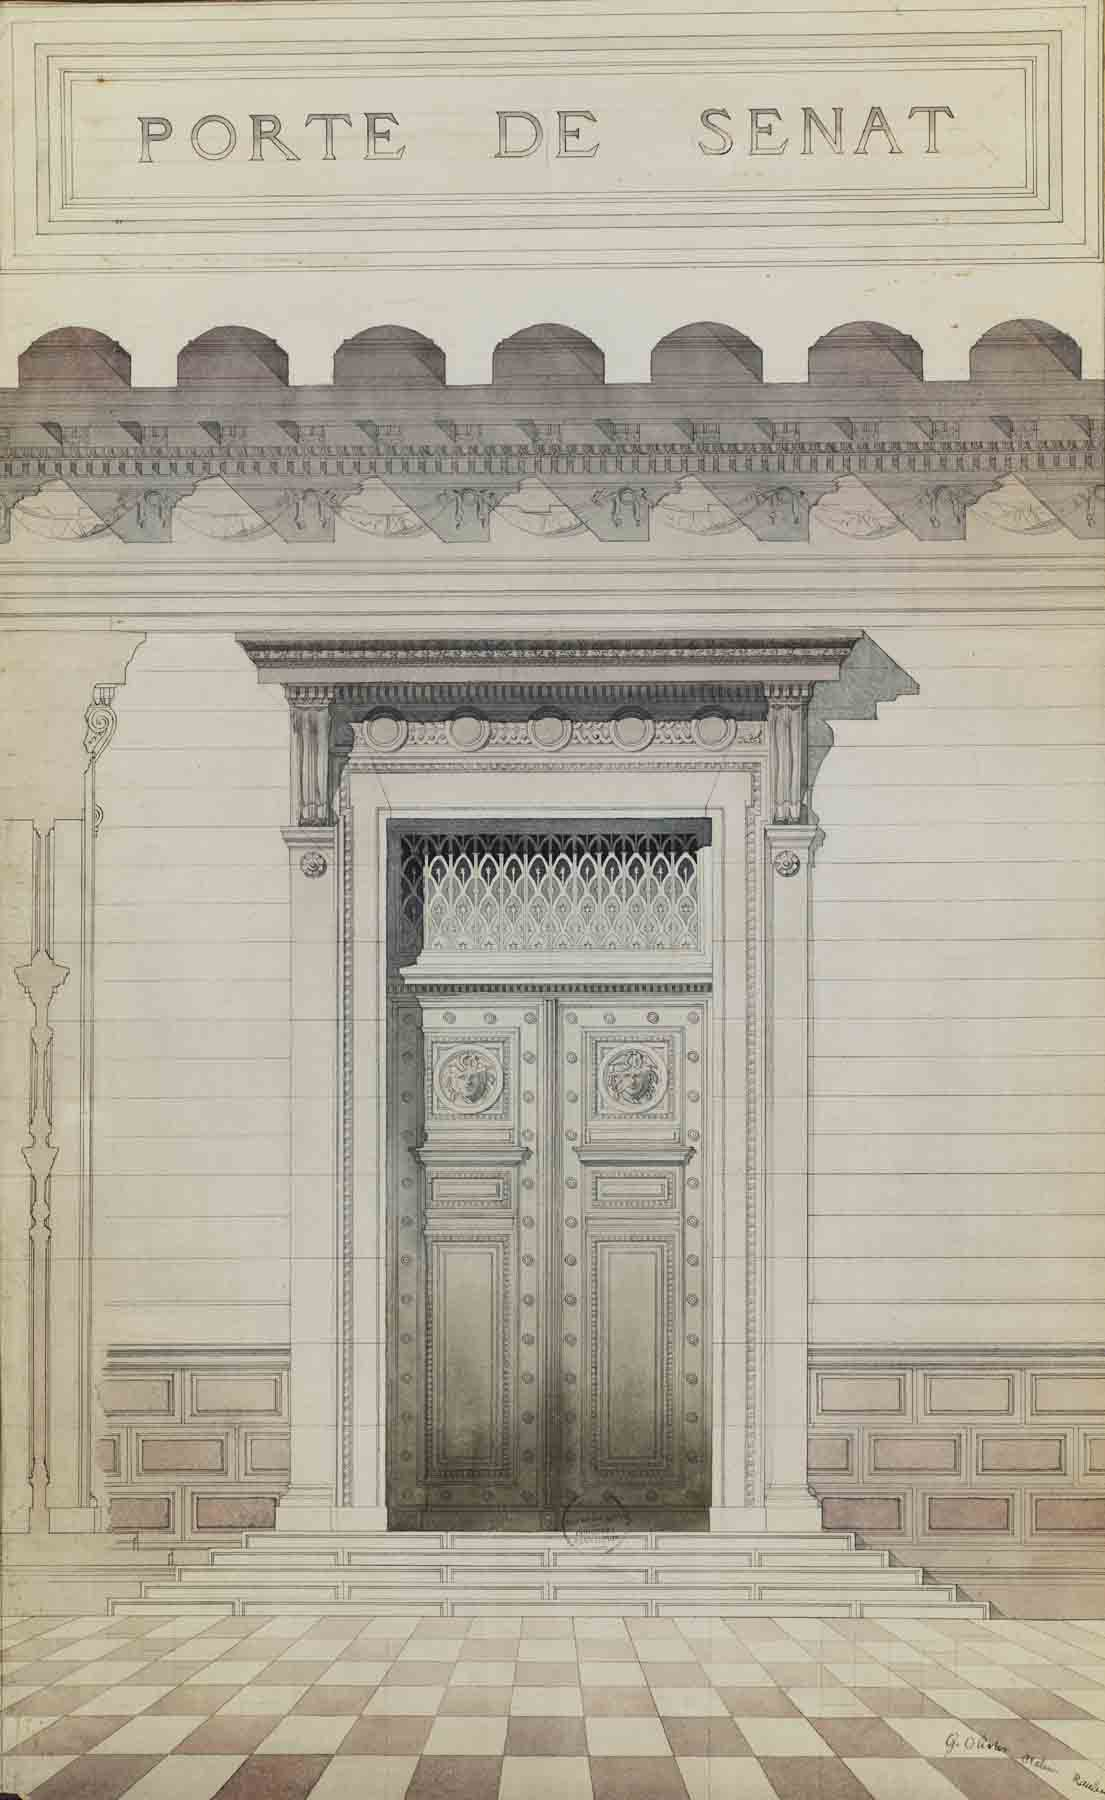 "Jules-Germain Olivier,  Senate Door,  late 1880s, pencil, ink and watercolor on paper,41 7/8 x 27 13/16"" framed"